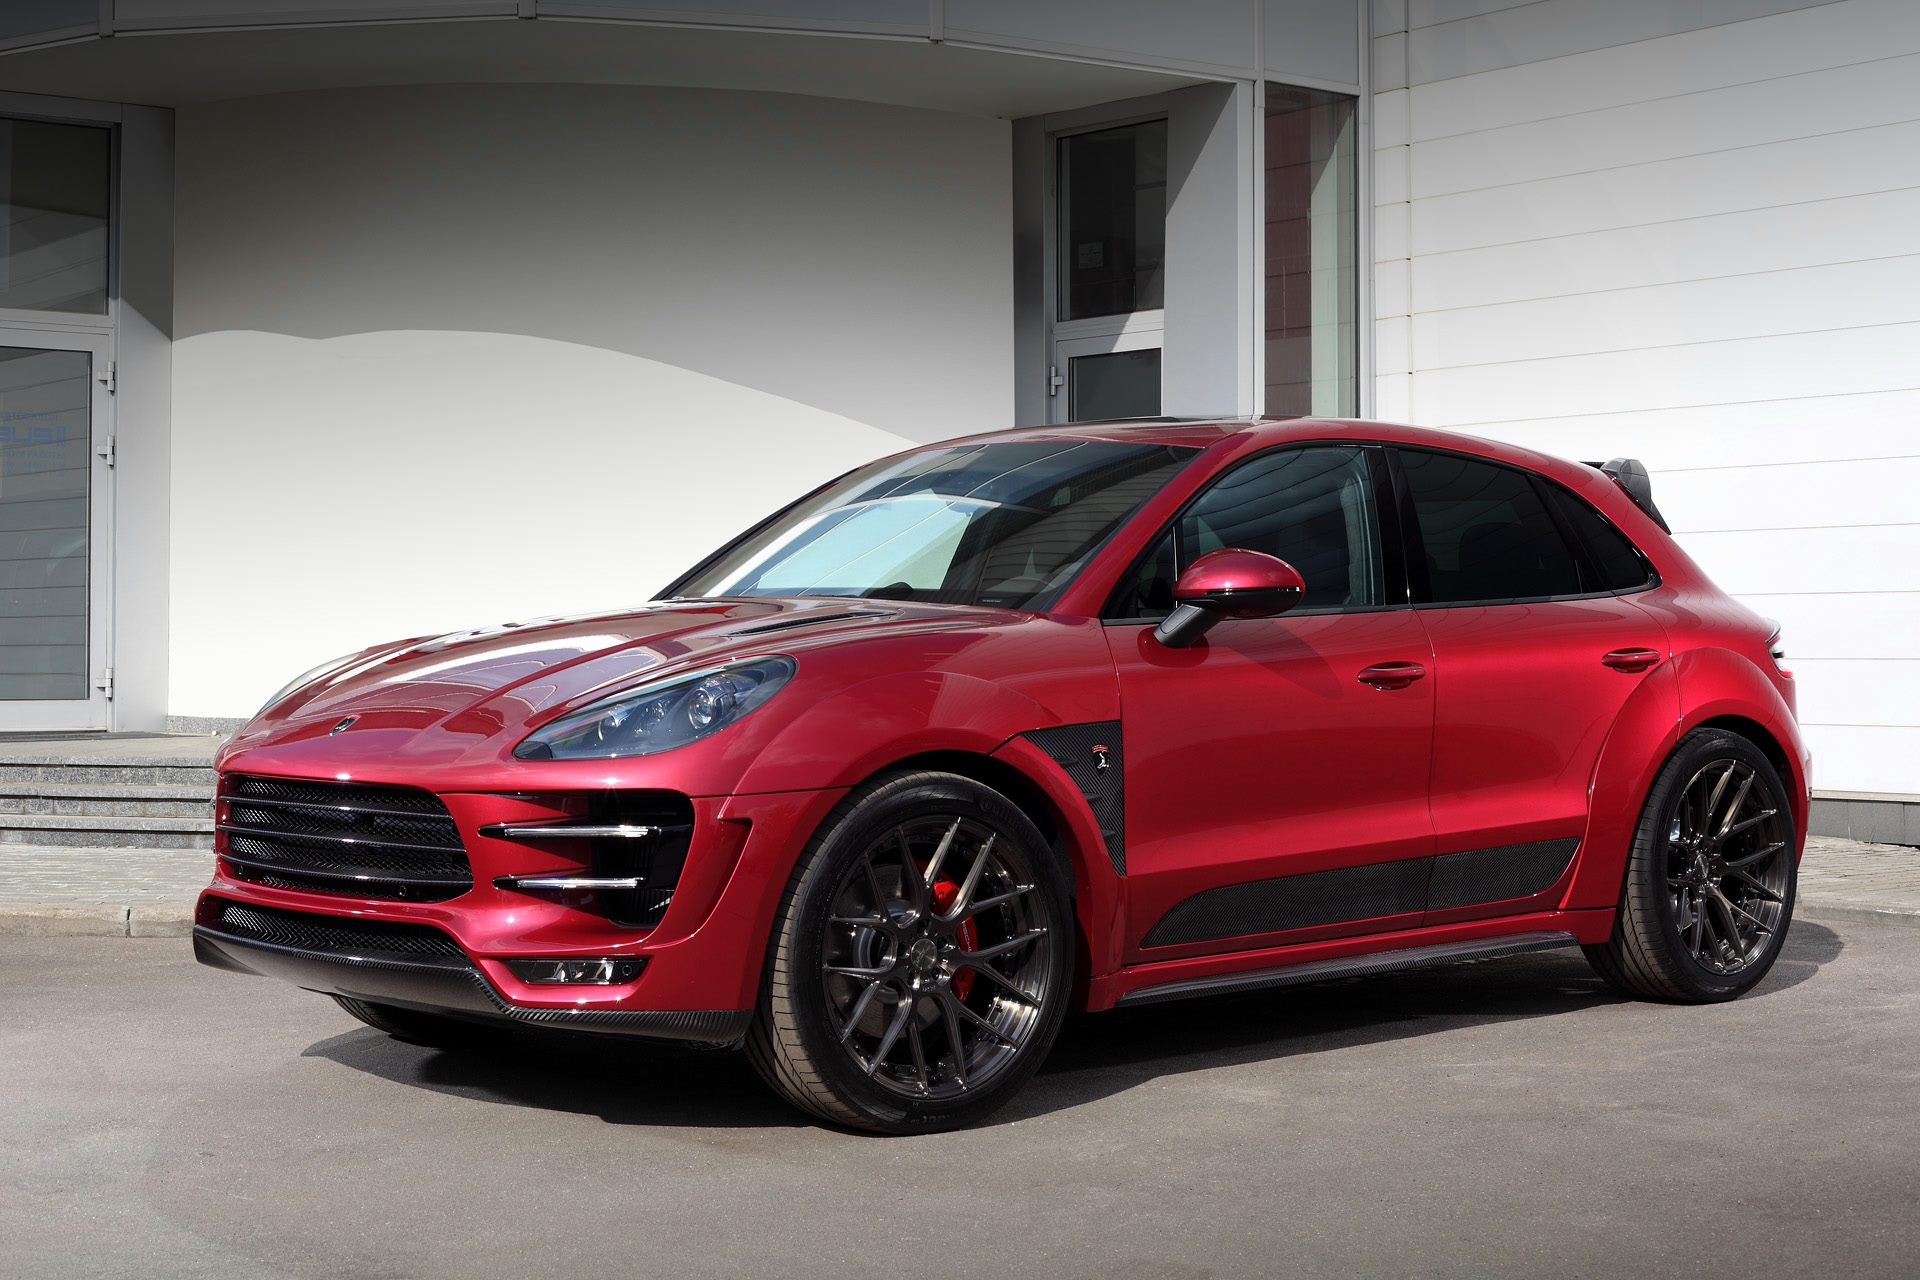 Porsche Mancan Ursa By Topcar Gets Cherry Red Paint And Adv 1 Wheels Autoevolution